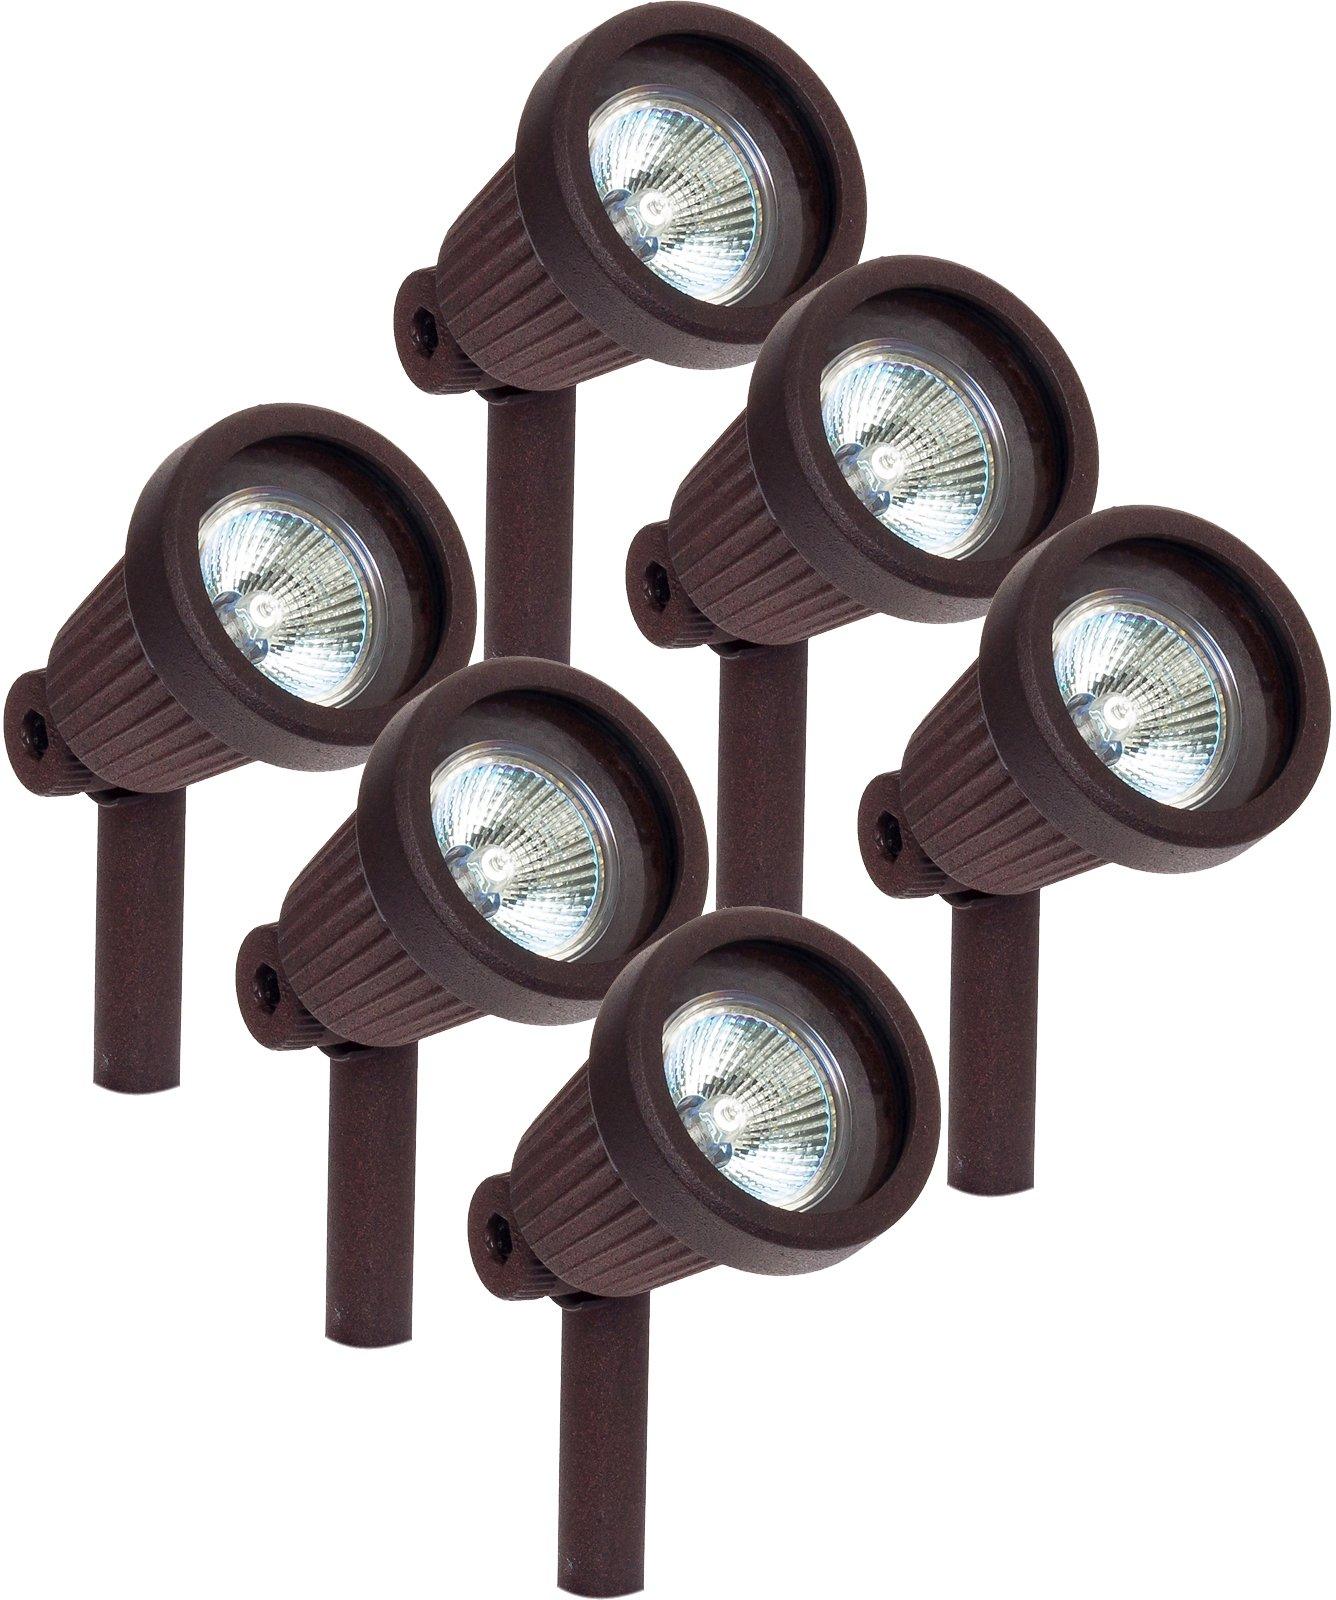 Paradise GL22724 Low Voltage Cast Aluminum 20W Spotlight (Bronze, 6 Pack)